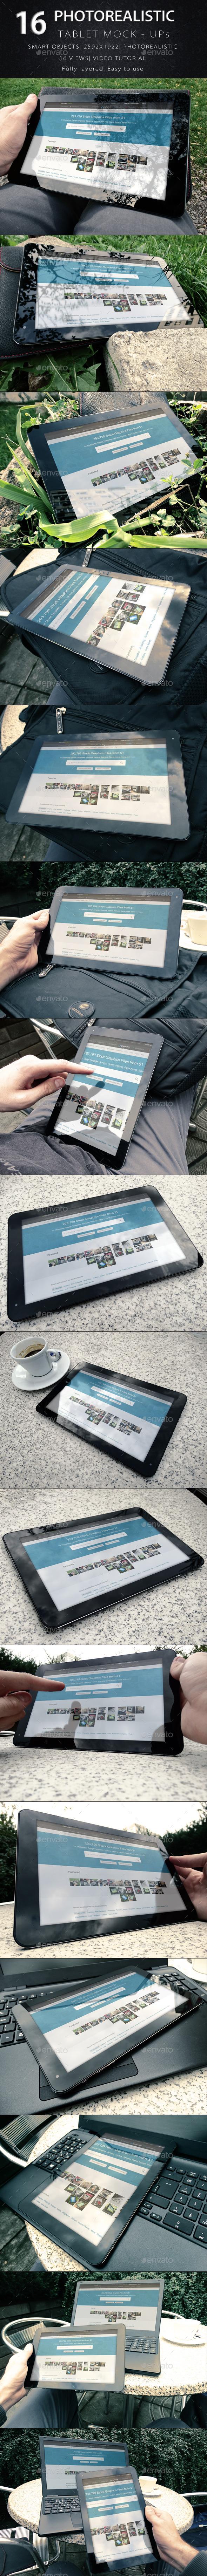 Photorealistic Tablet/Laptop Mock-Ups - Product Mock-Ups Graphics